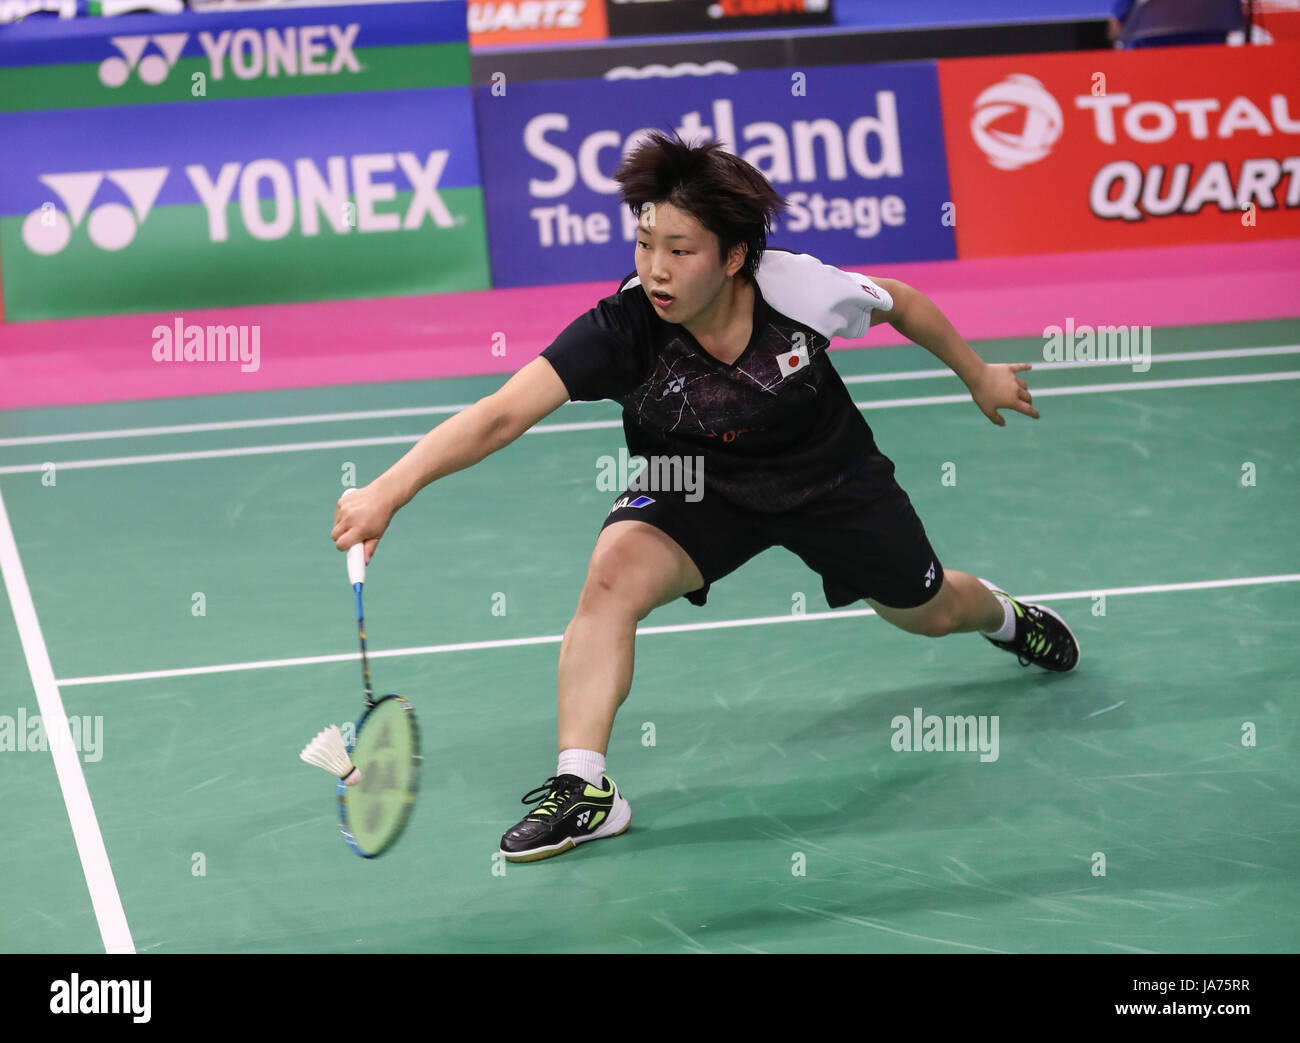 GLASGOW Aug 25 2017 Xinhua Akane Yamaguchi of